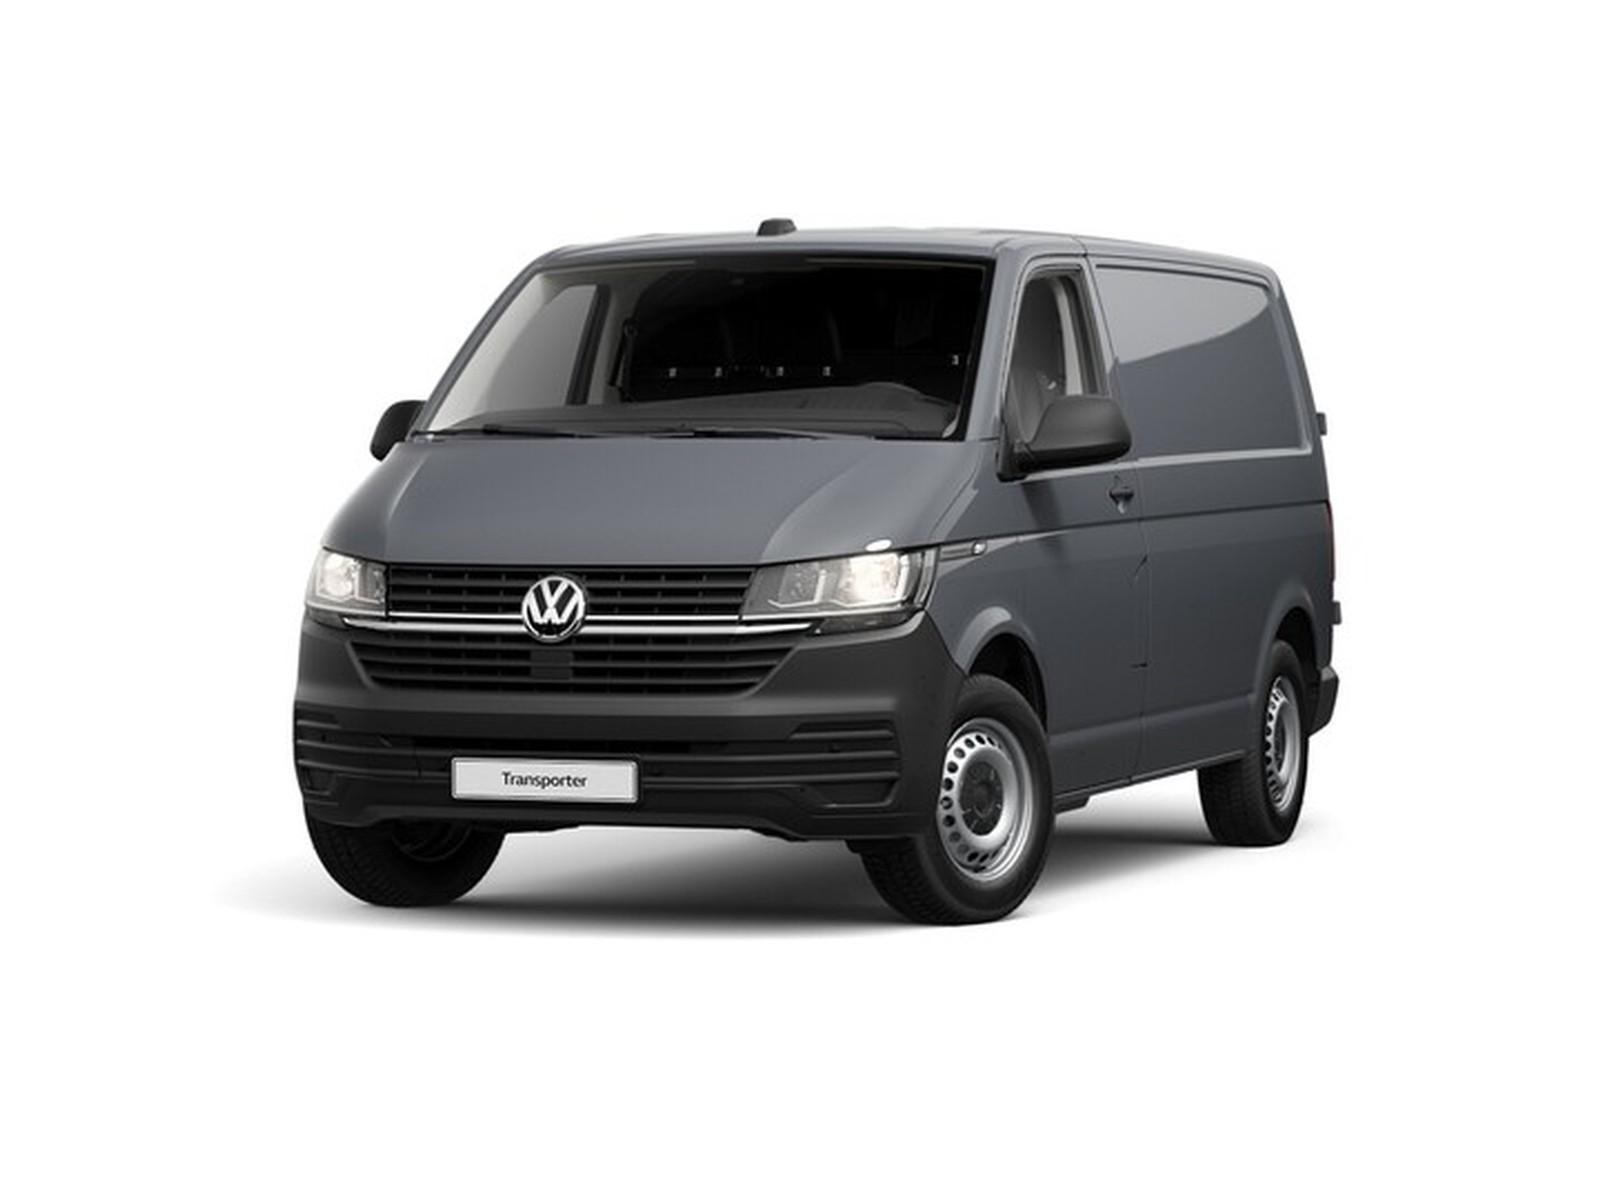 Volkswagen T6 Transporter T6.1 28 2.0 tdi 110cv Business p.c.